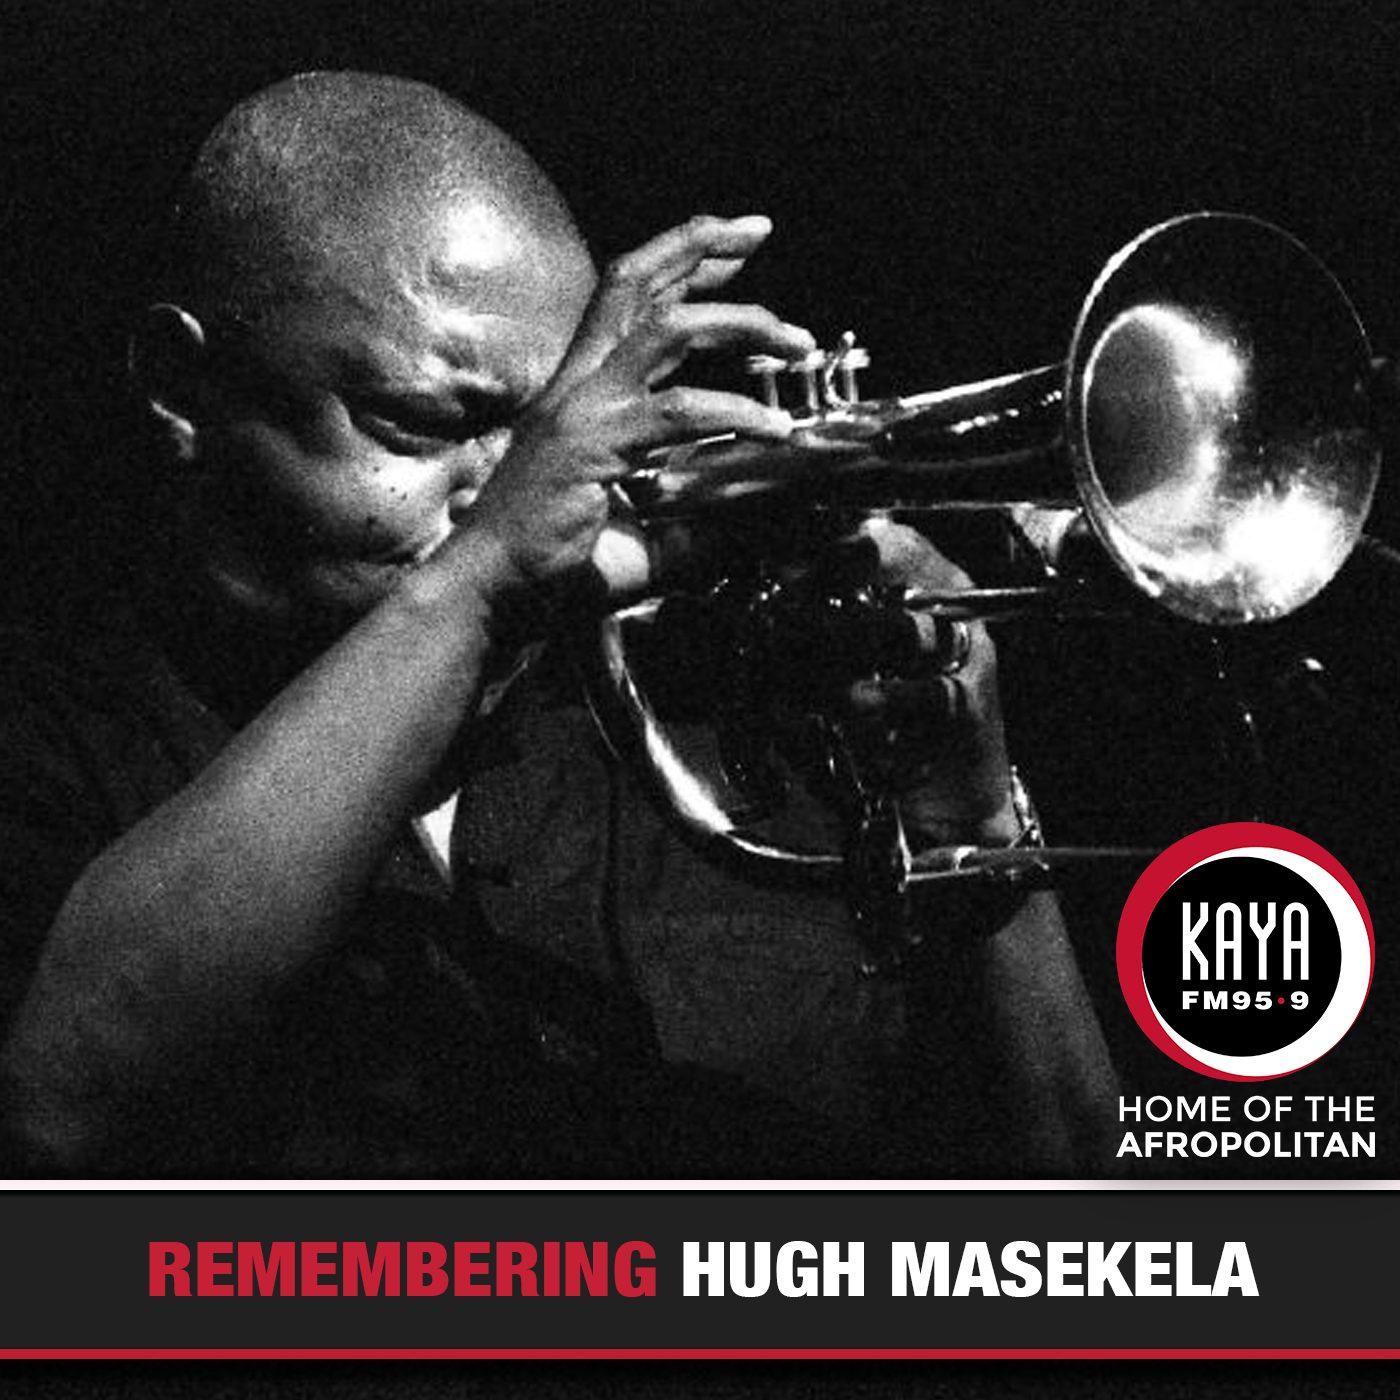 kaya fm legend tributes, hugh masekela kaya fm tribute,